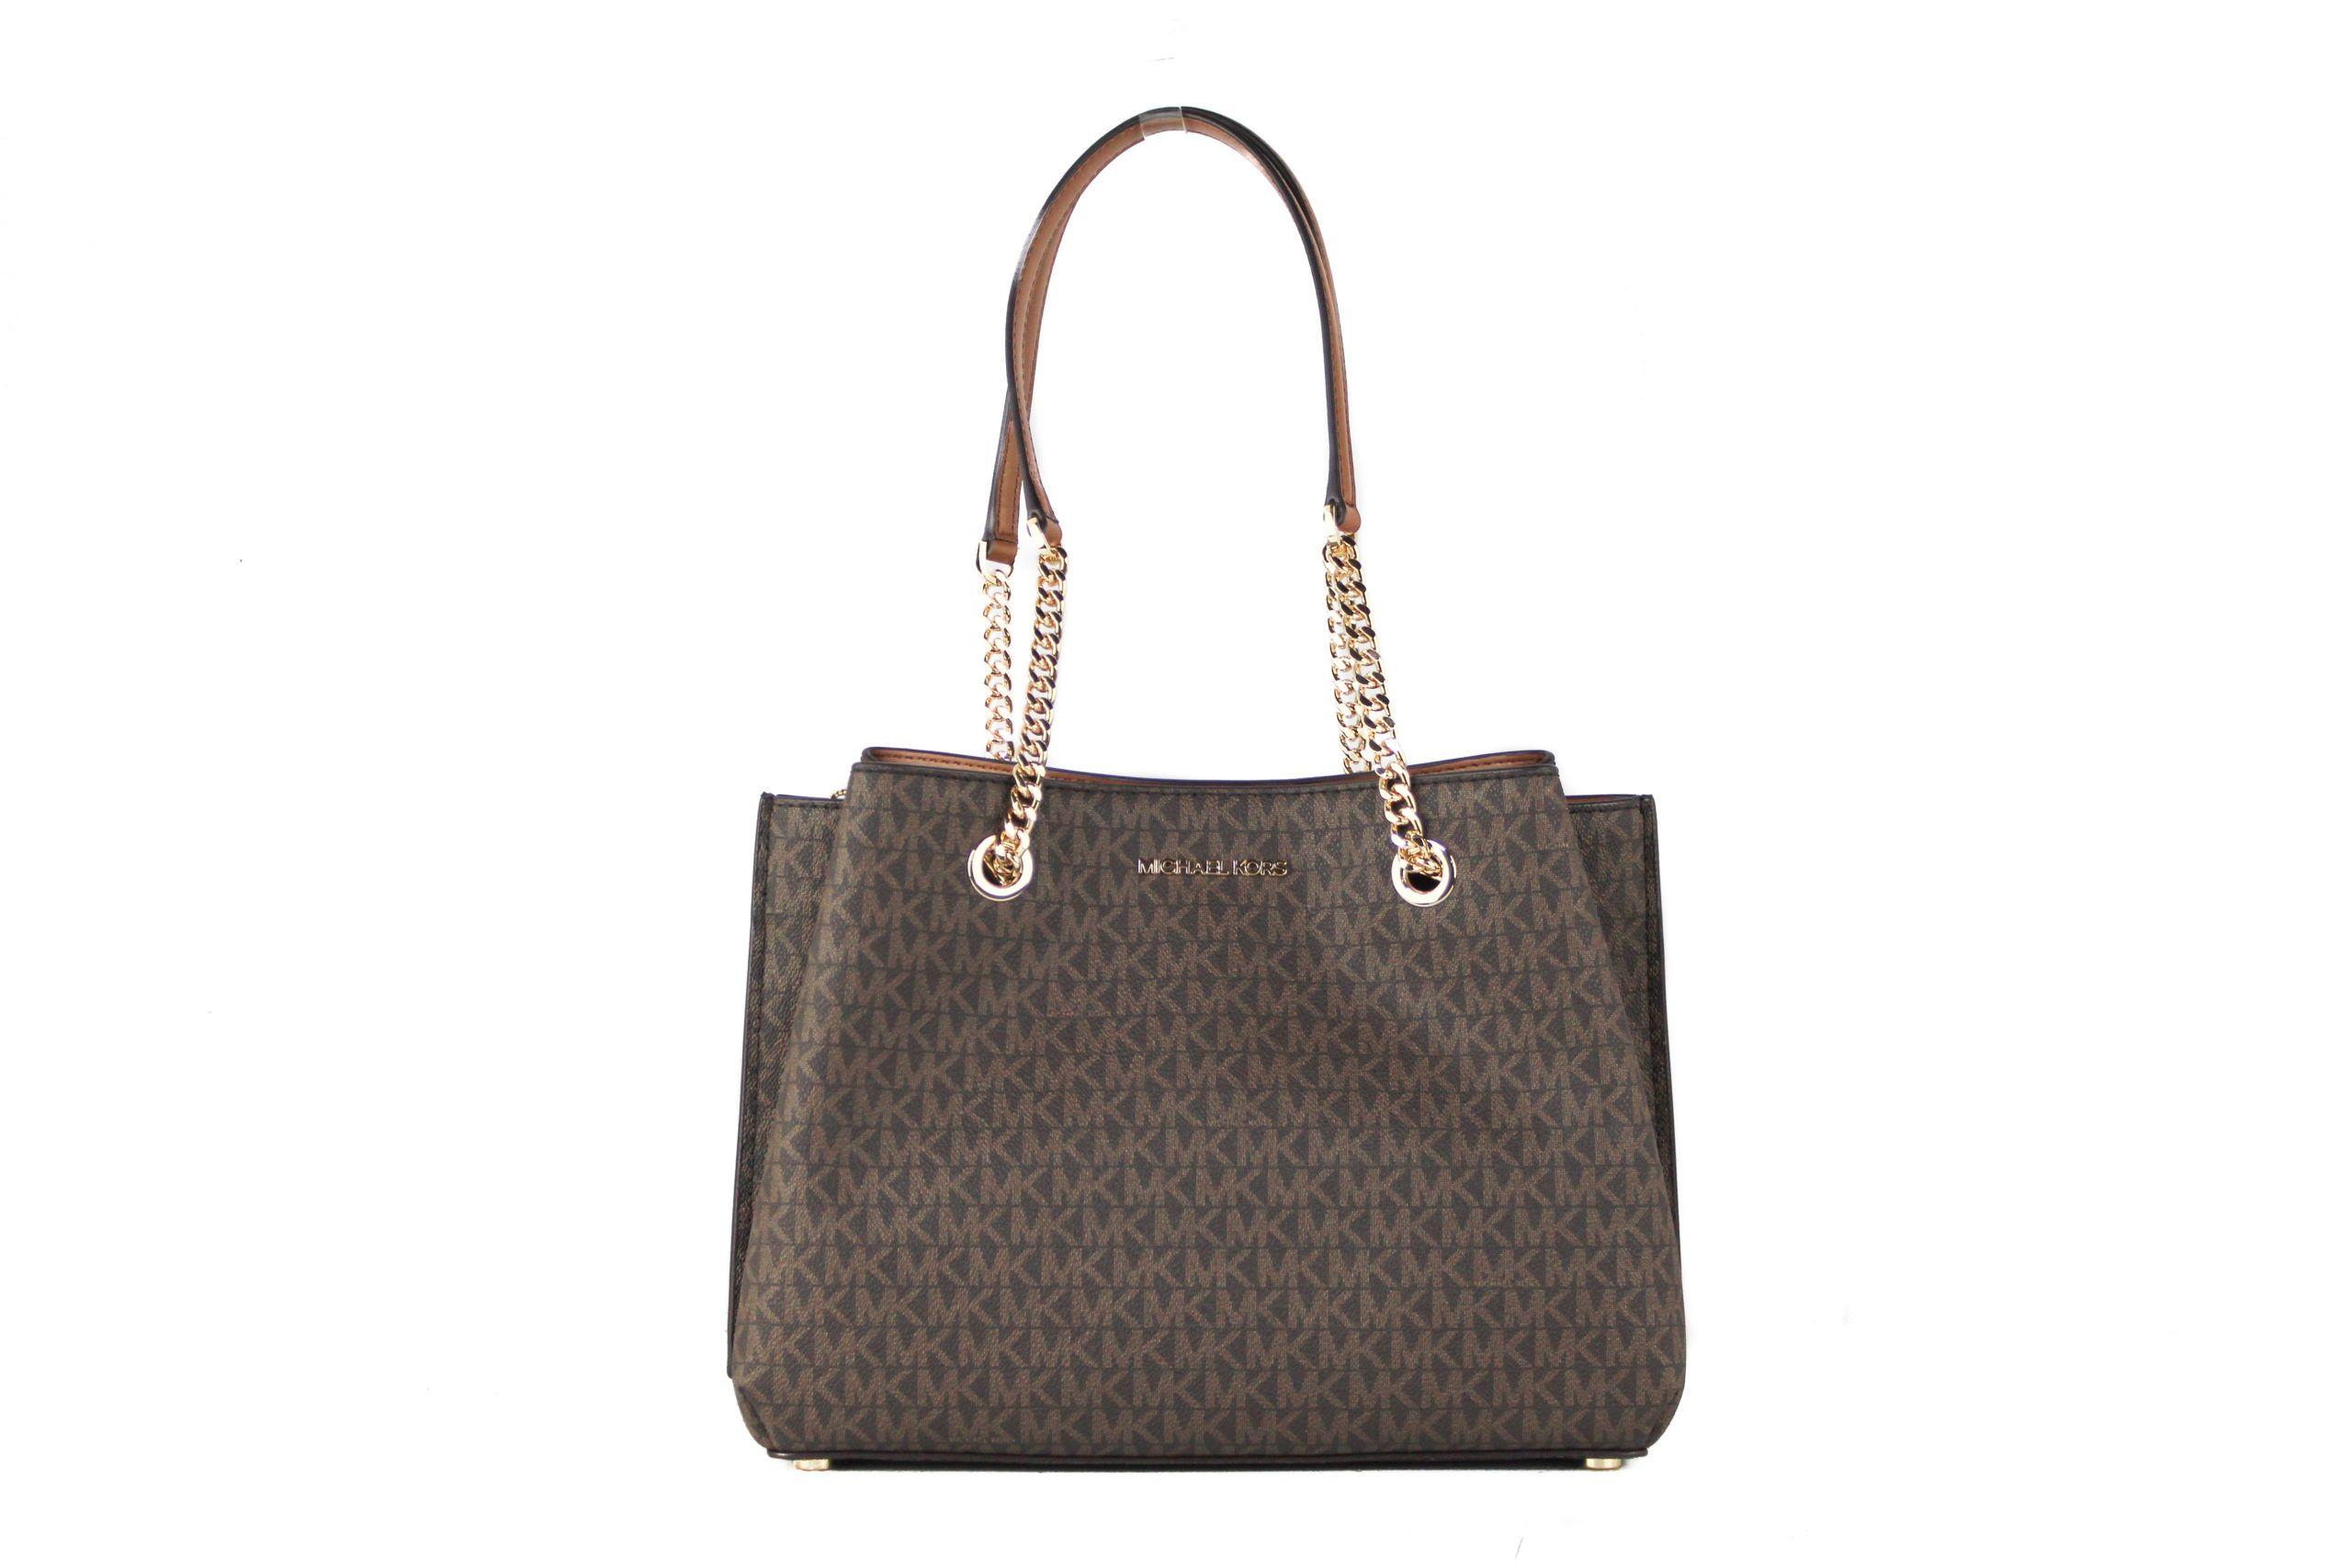 Michael Kors Teagen Large Leather Long Drop Satchel Handbag (Brown Signature)